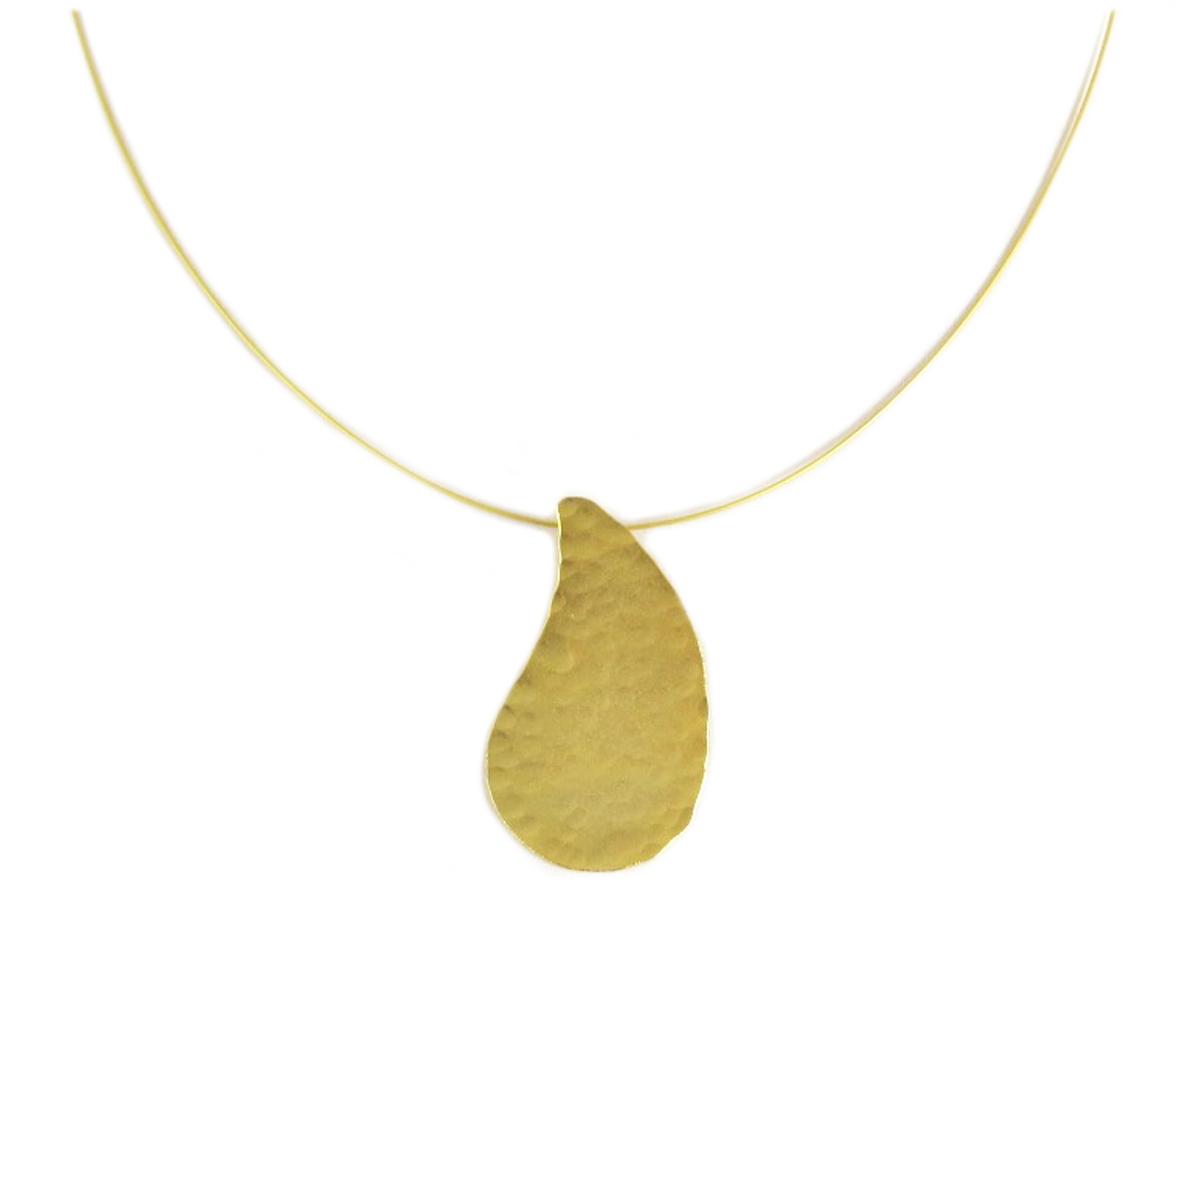 Collier artisanal \'Athena\' doré  - 40x22 mm - [Q7881]